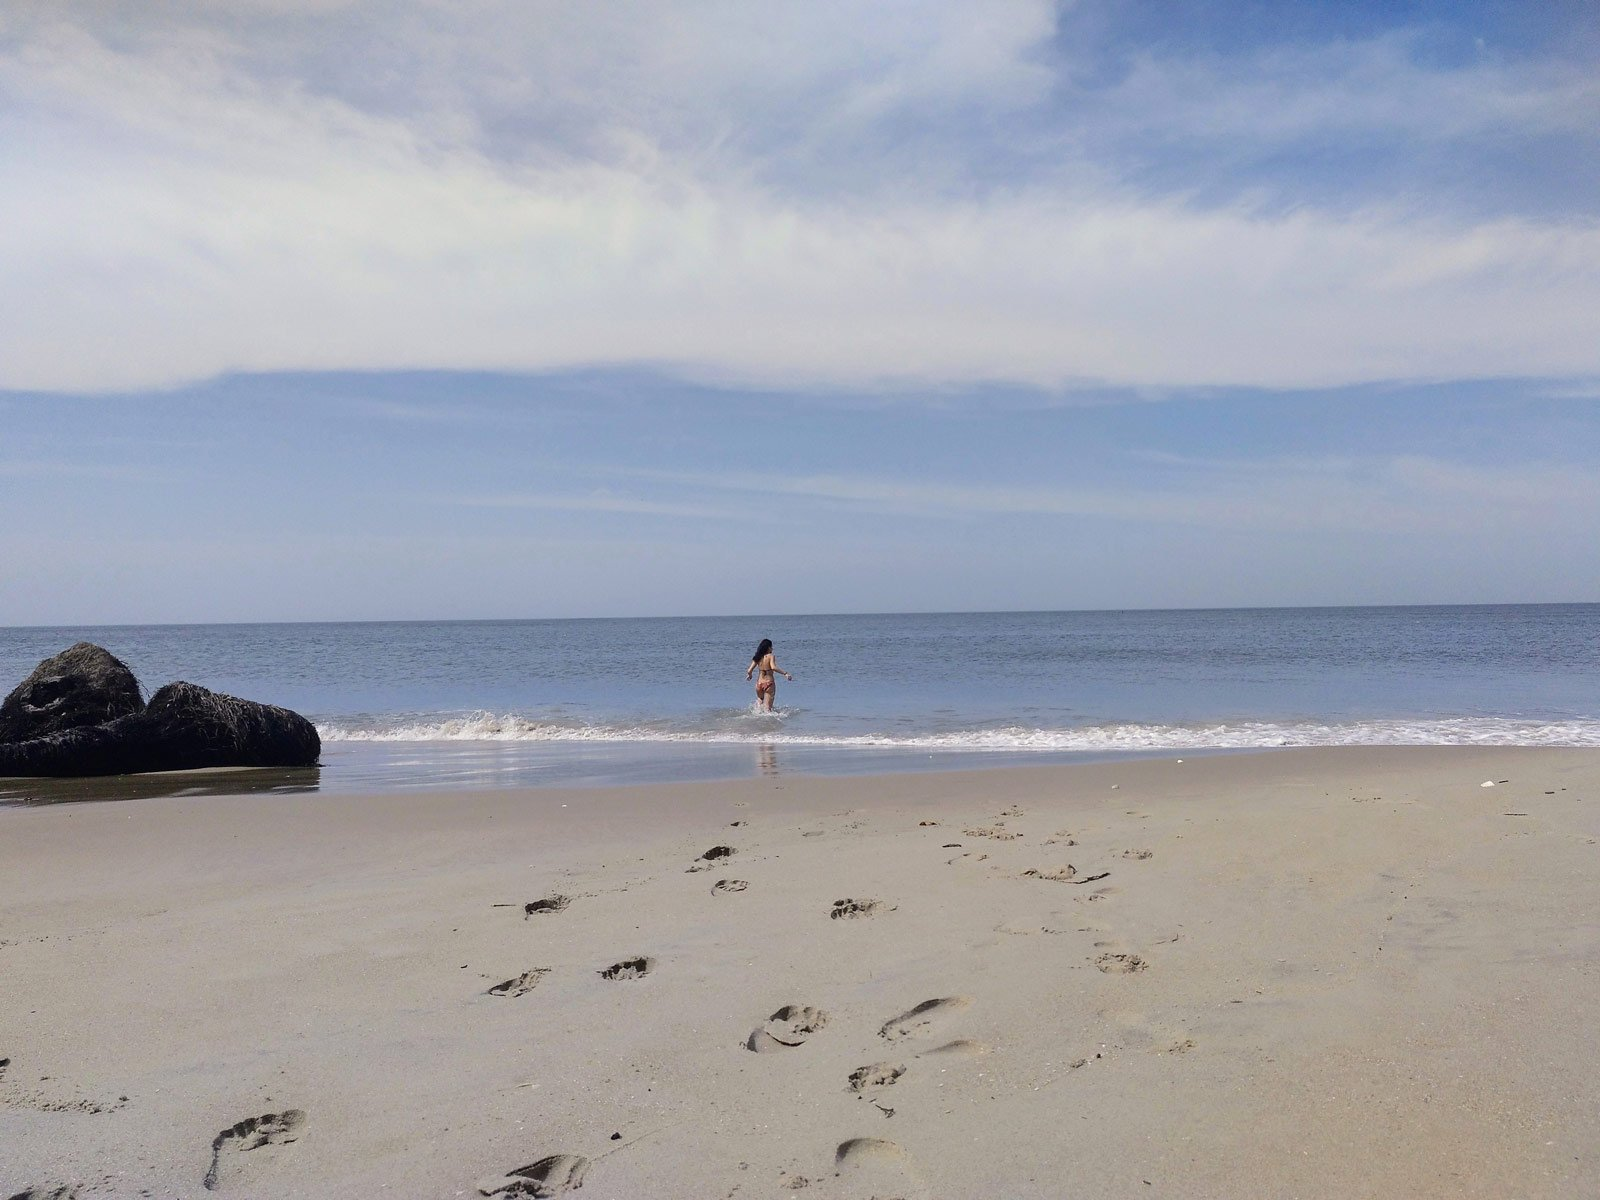 Senegal playa desierta